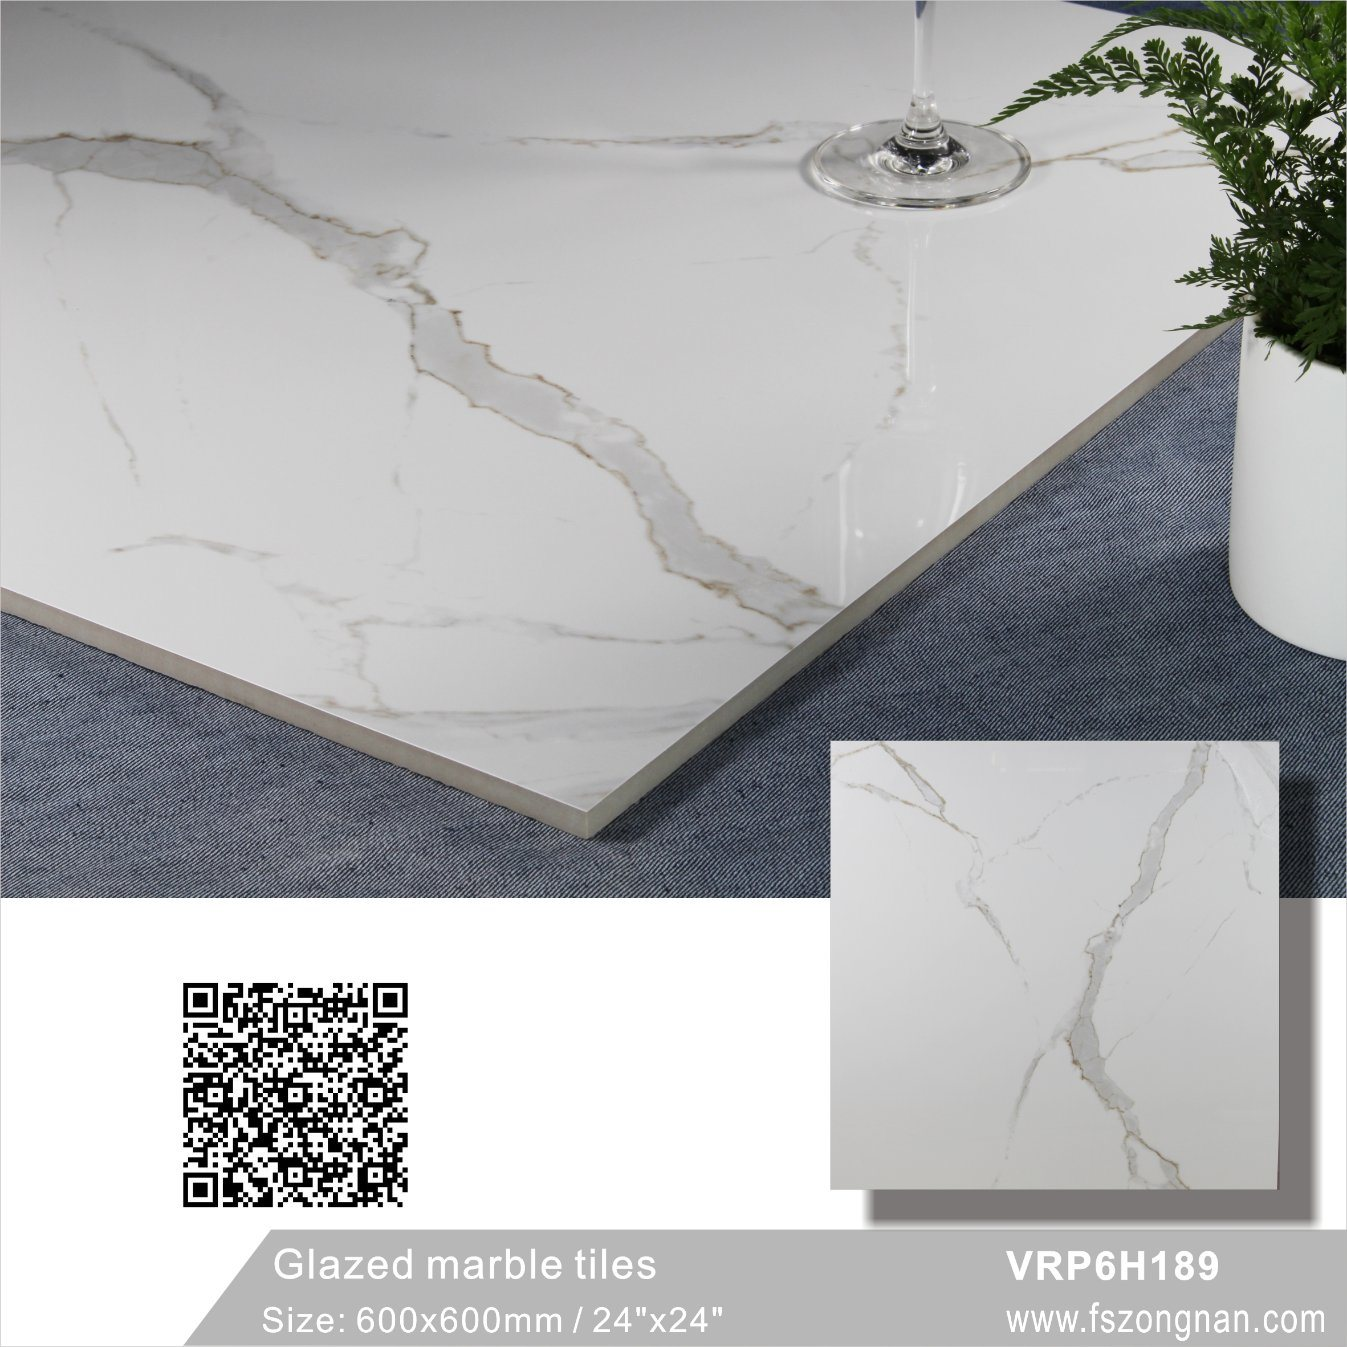 China Carara White Glazed Marble Polished Porcelain Floor Tile For